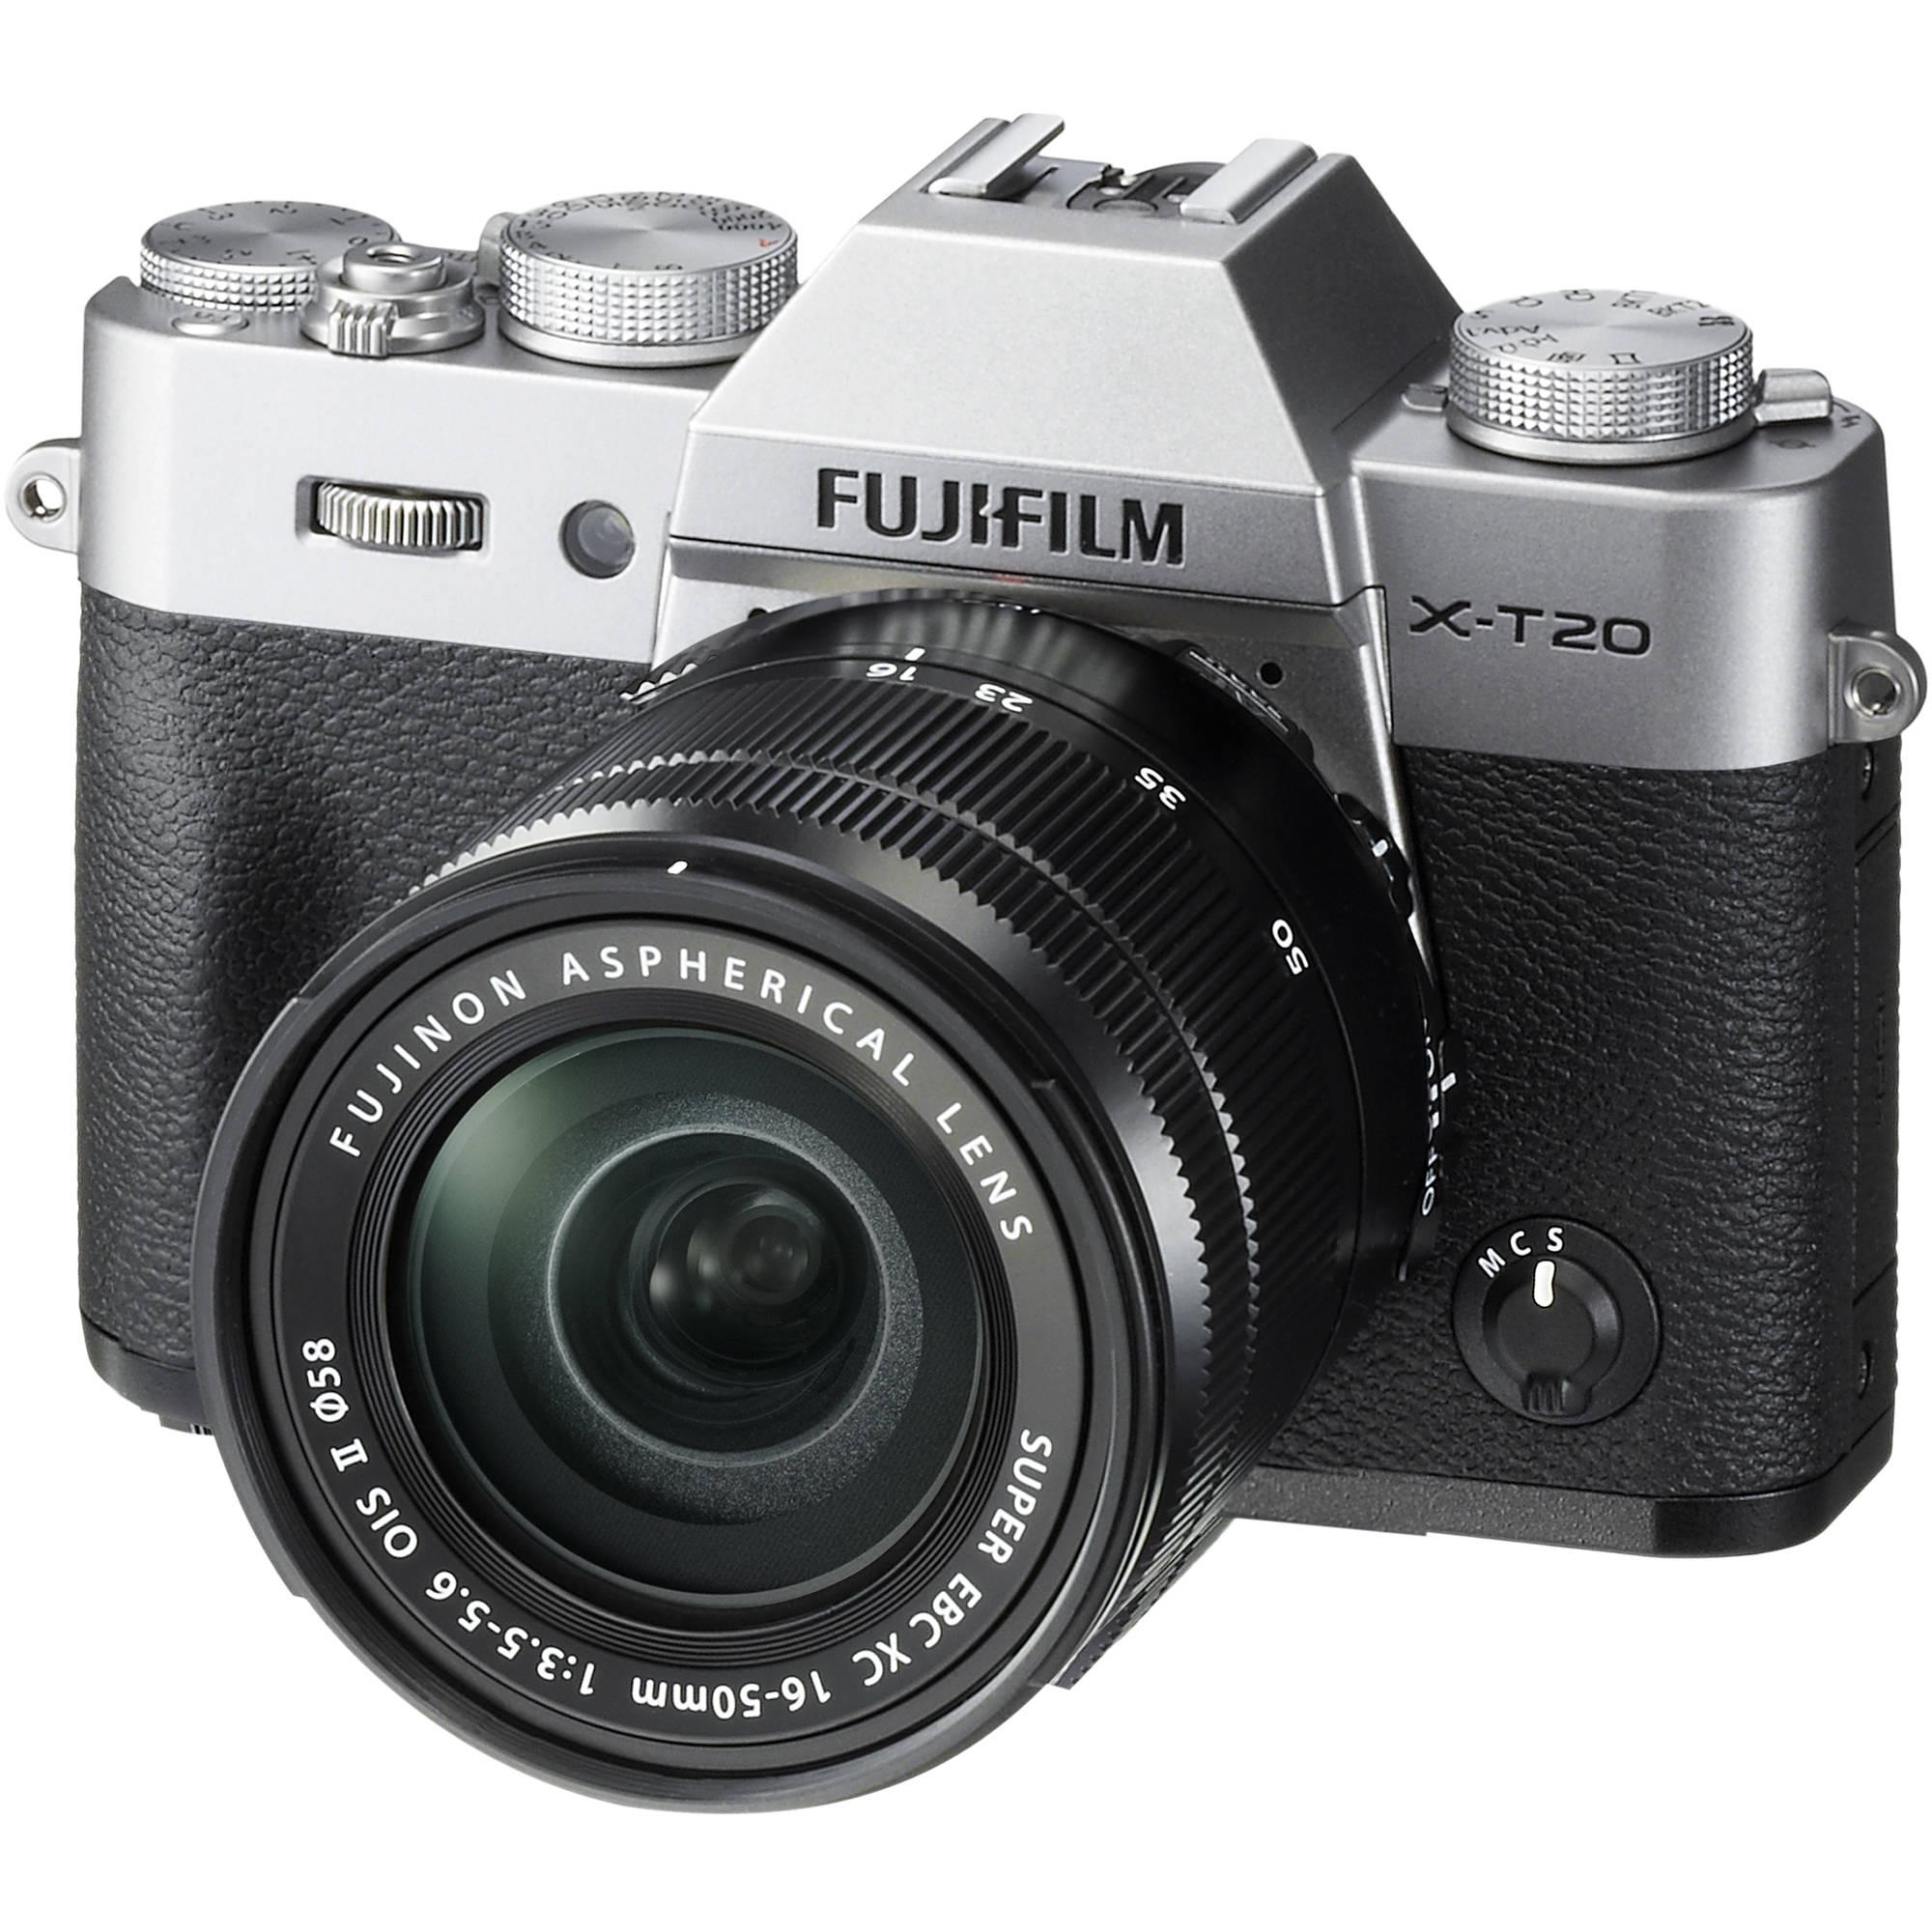 Fuji Digital Cameras: FUJIFILM X-T20 Mirrorless Digital Camera With 16-50mm 16542880